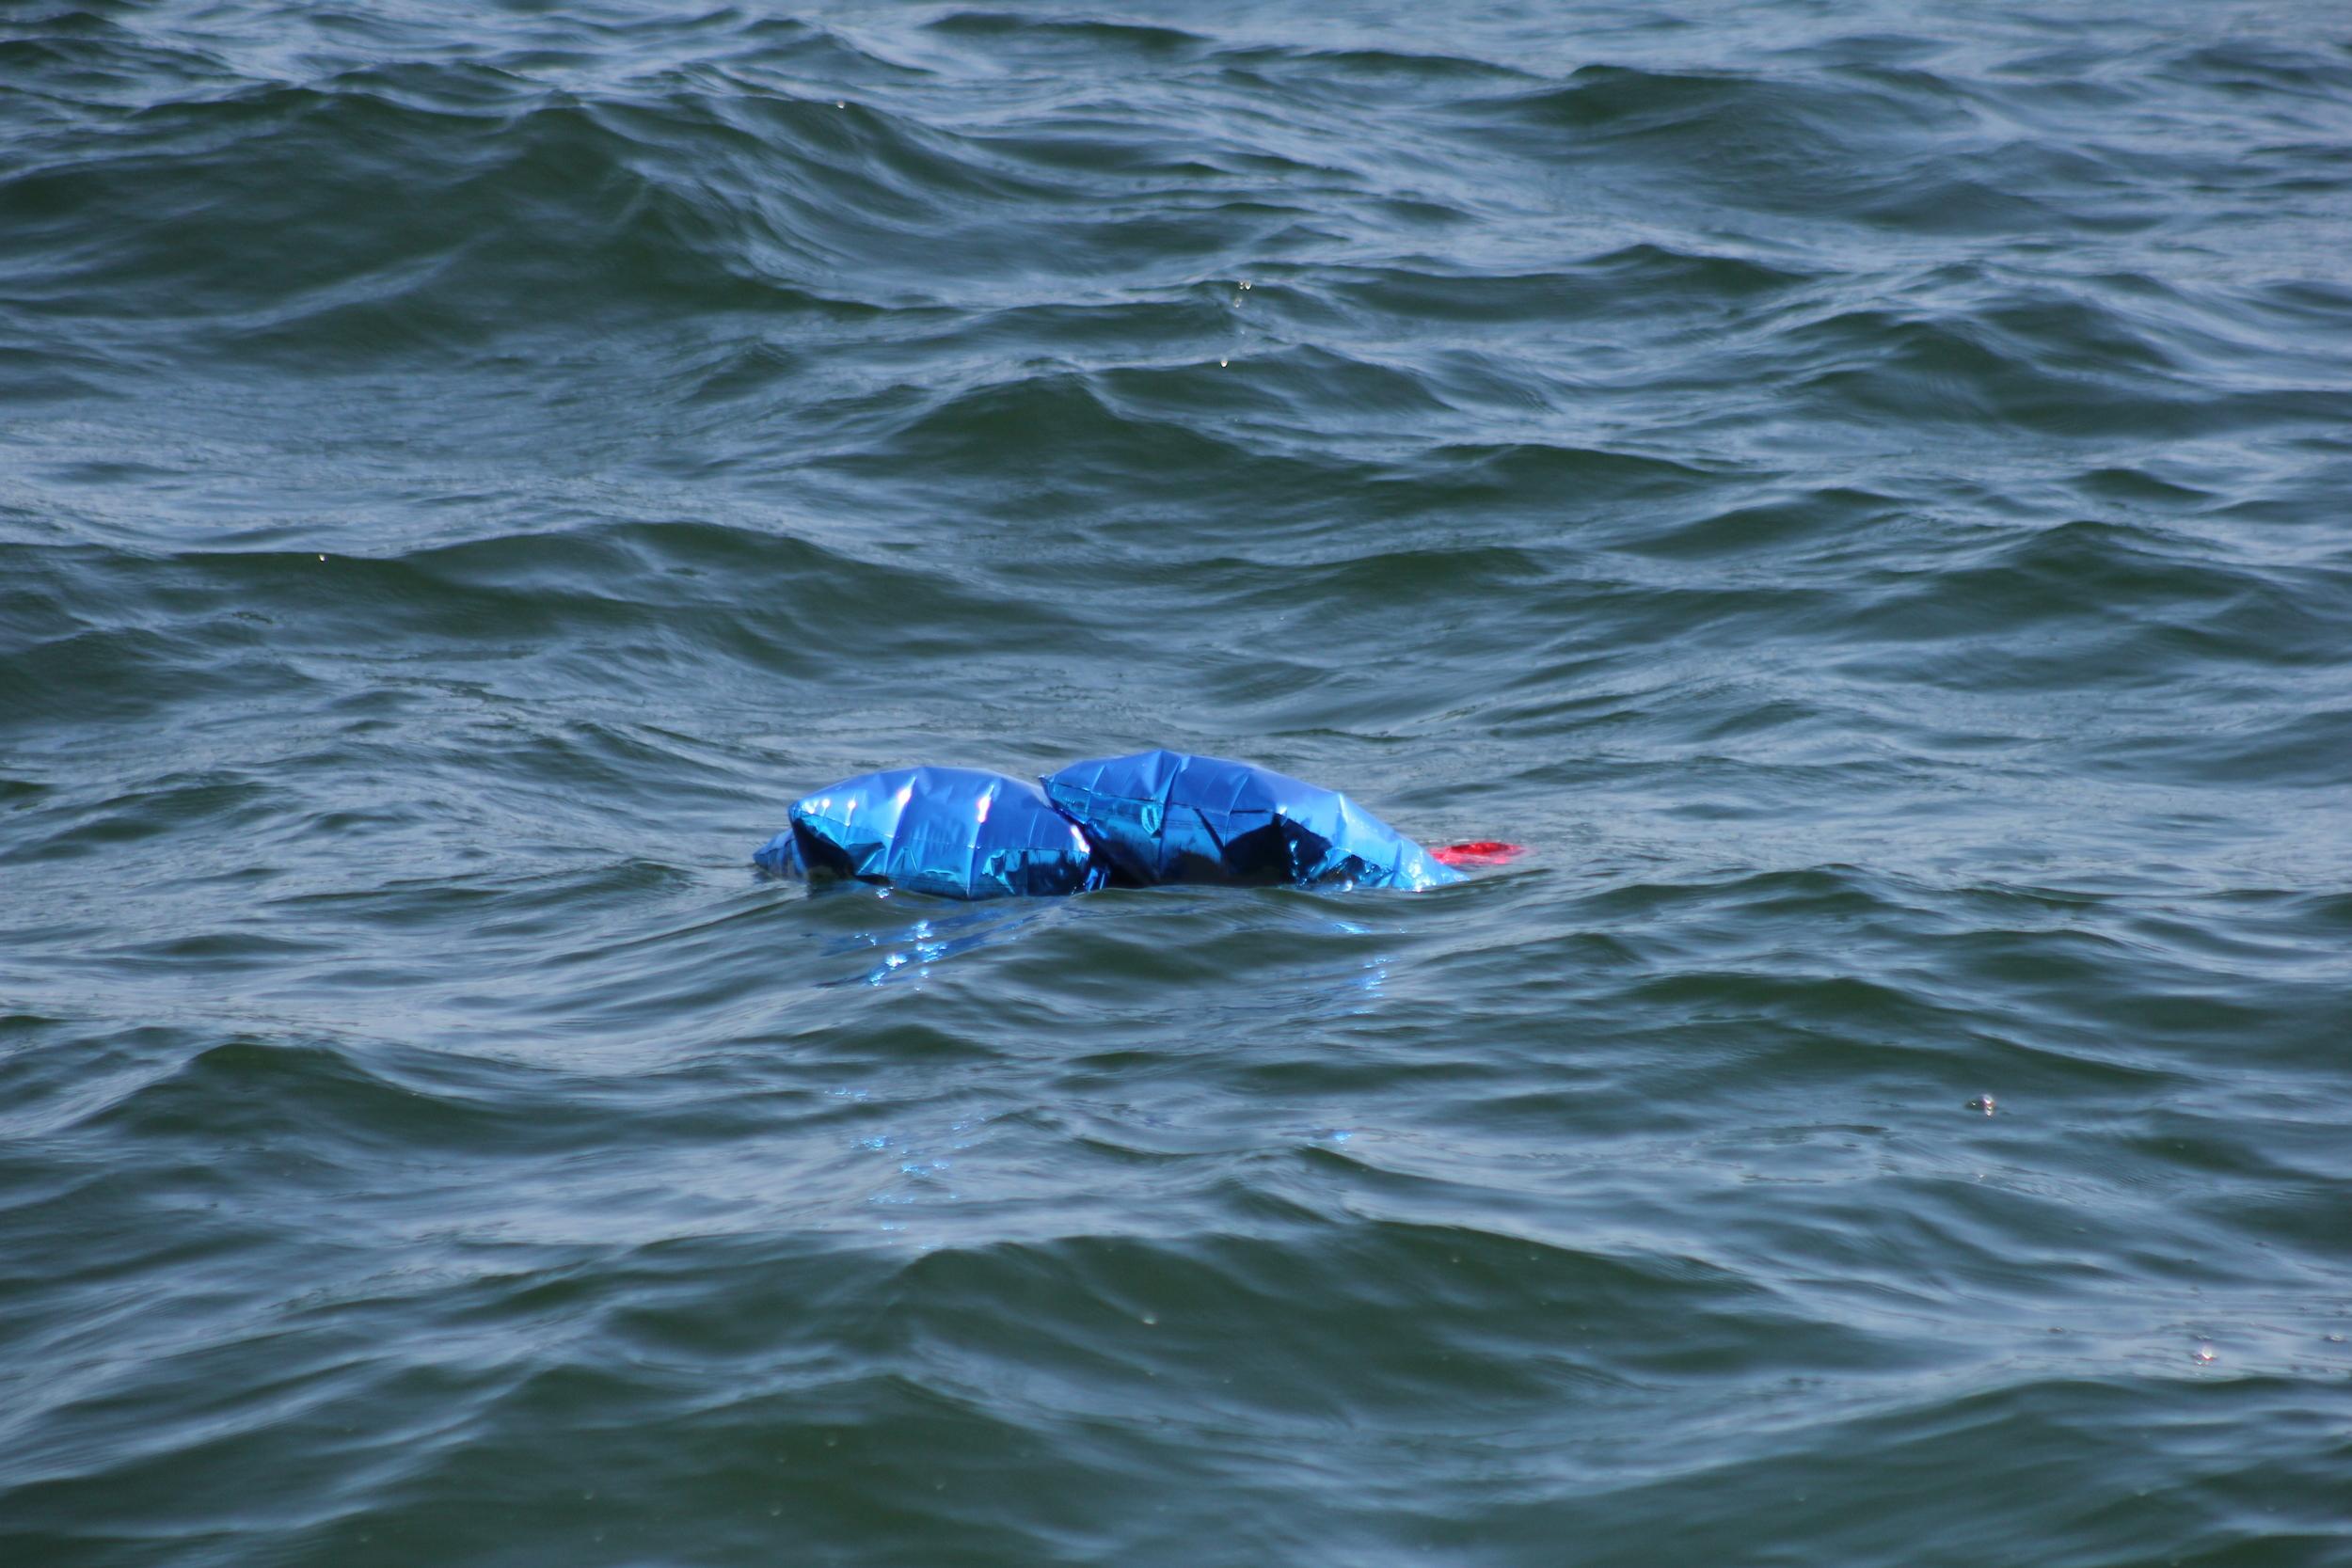 Floating Balloons, Photo Credit: Liz Summit, 2015